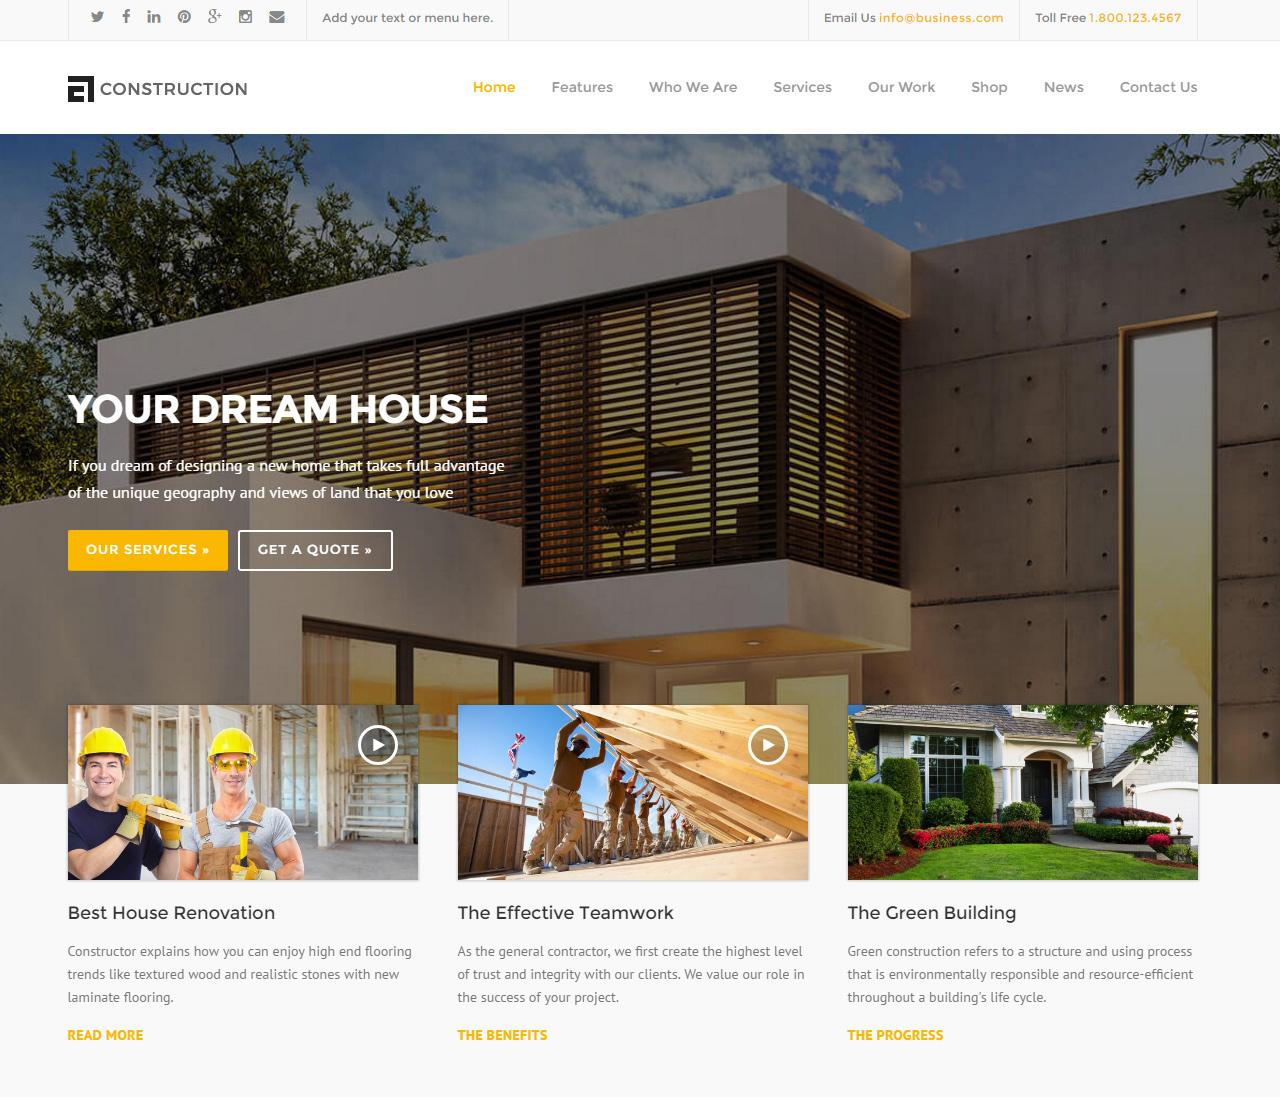 Construction — WP Construction, Building Business — 1 — 10439297